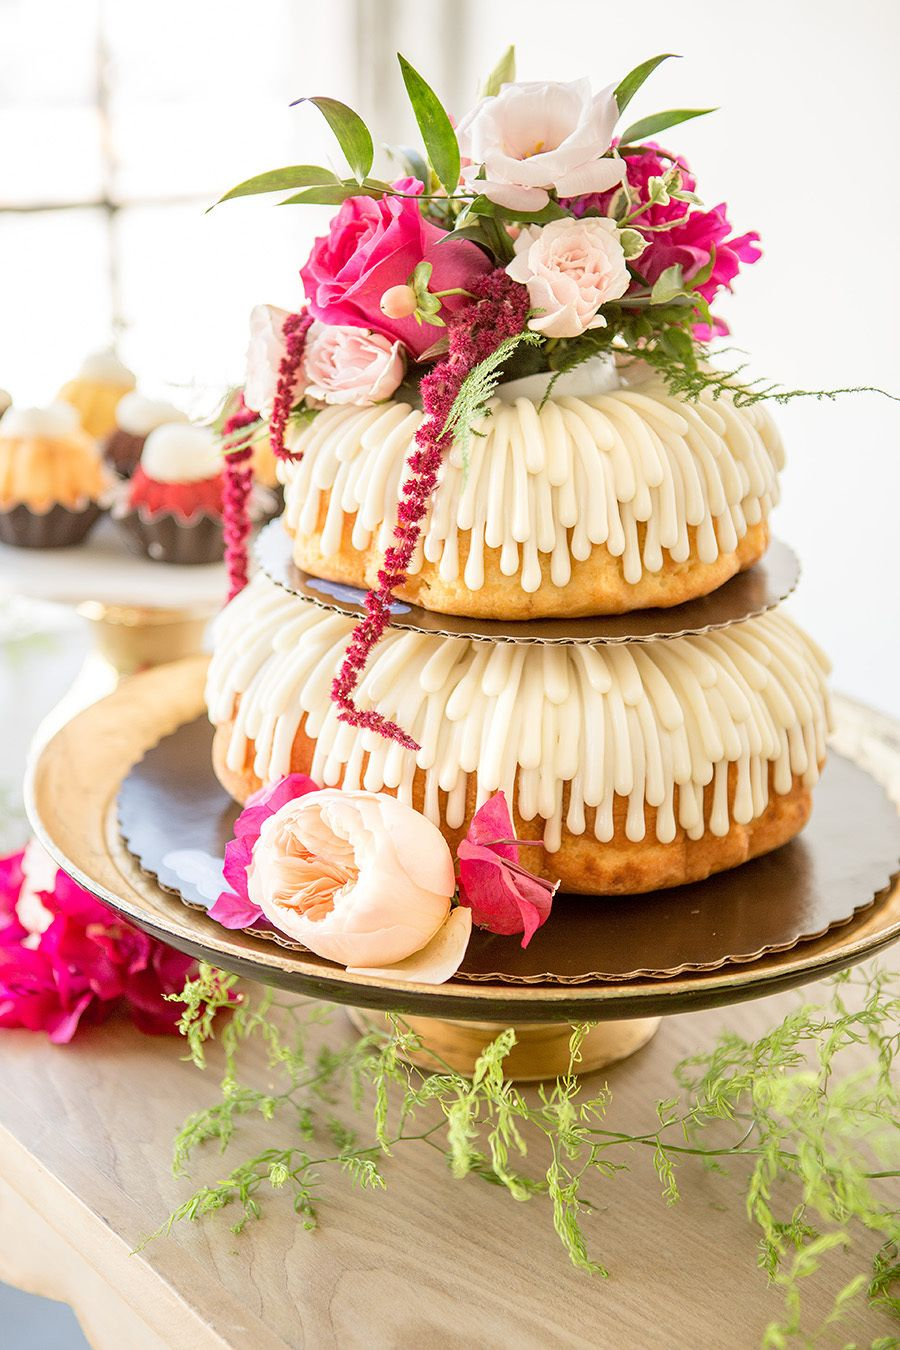 Pin by Jackeline Lopez on Nothing Bundt Cakes & Dessert